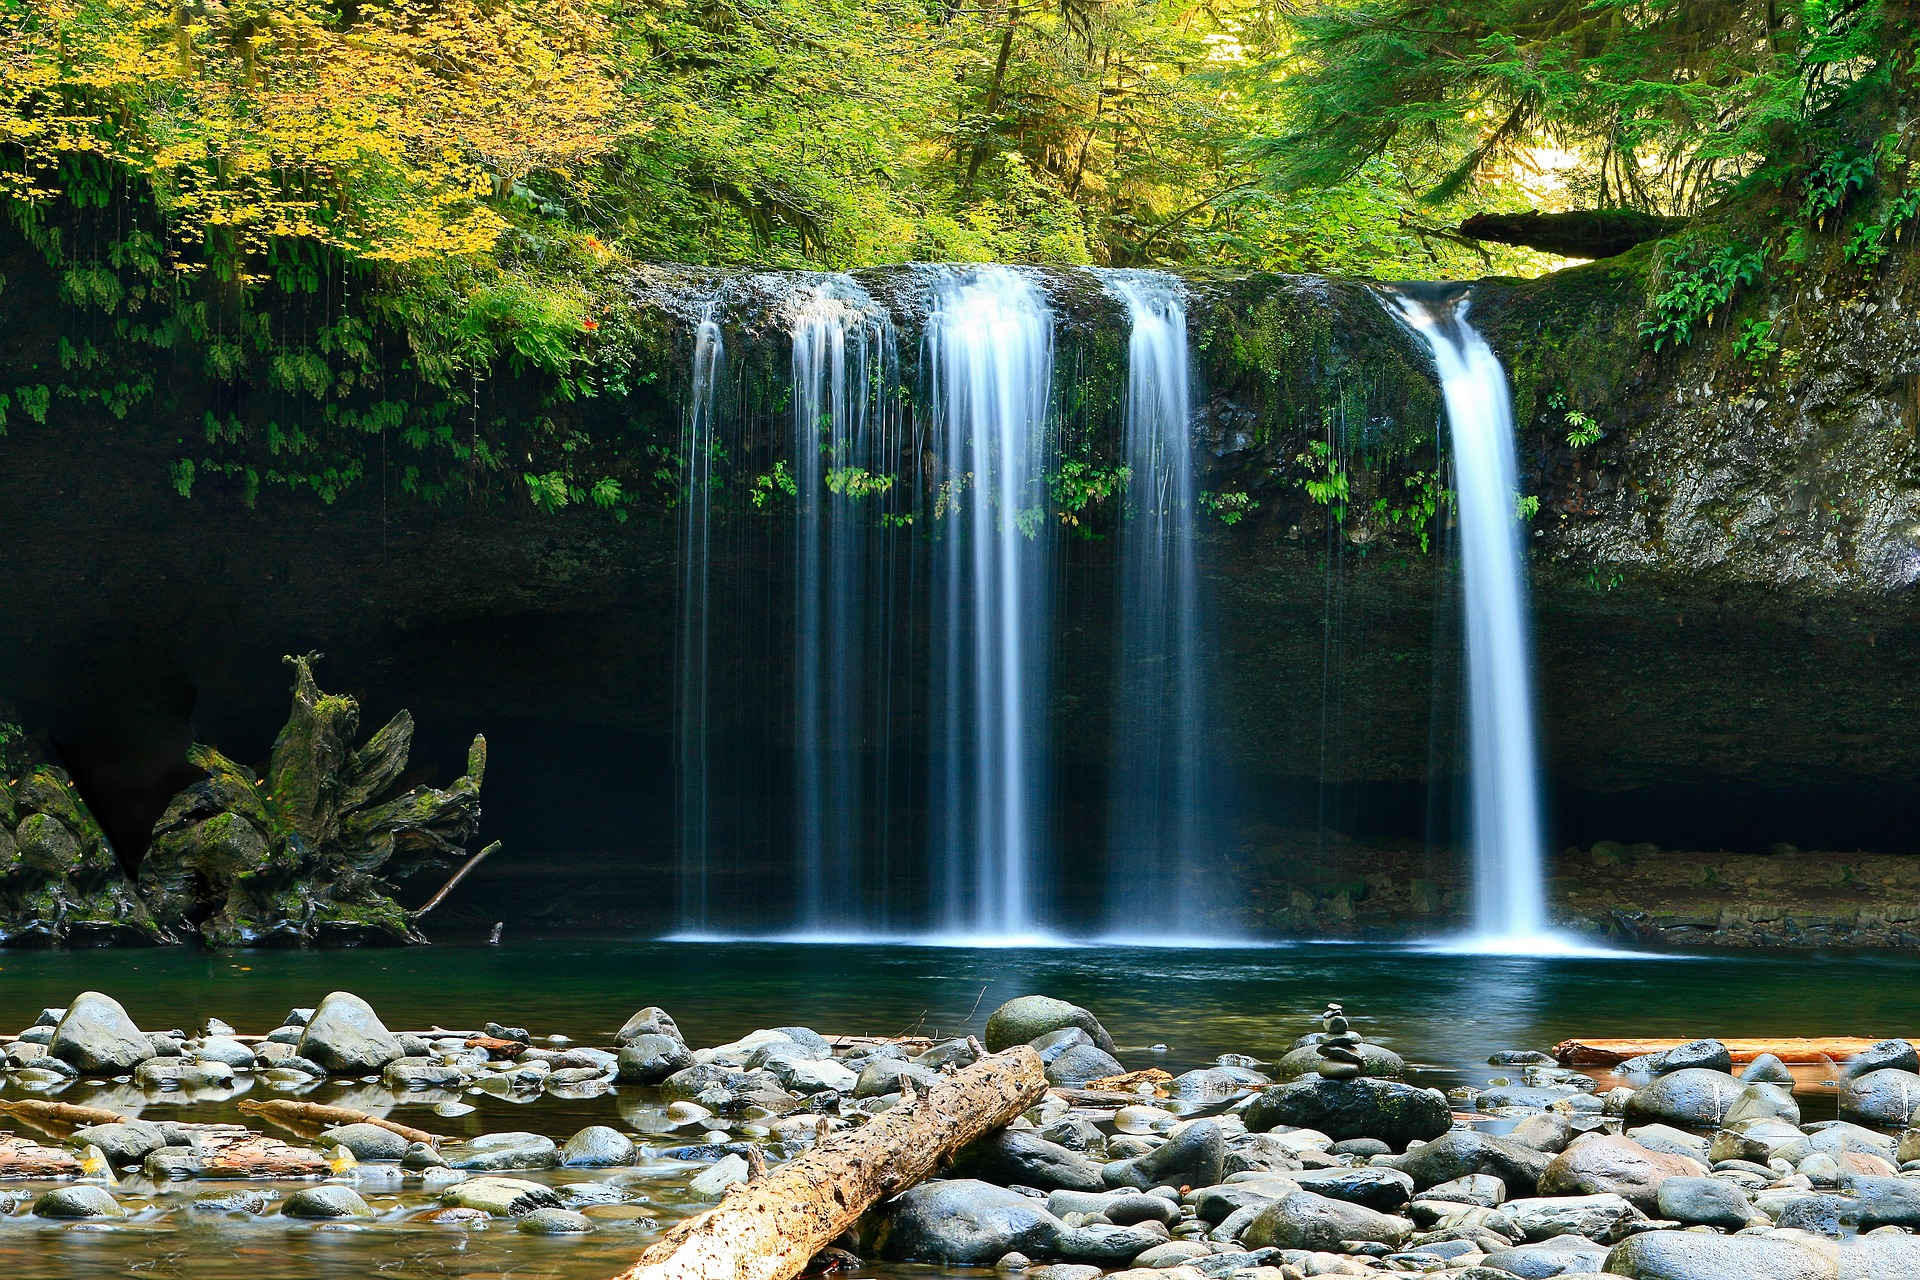 waterfall-802003_1920.jpg